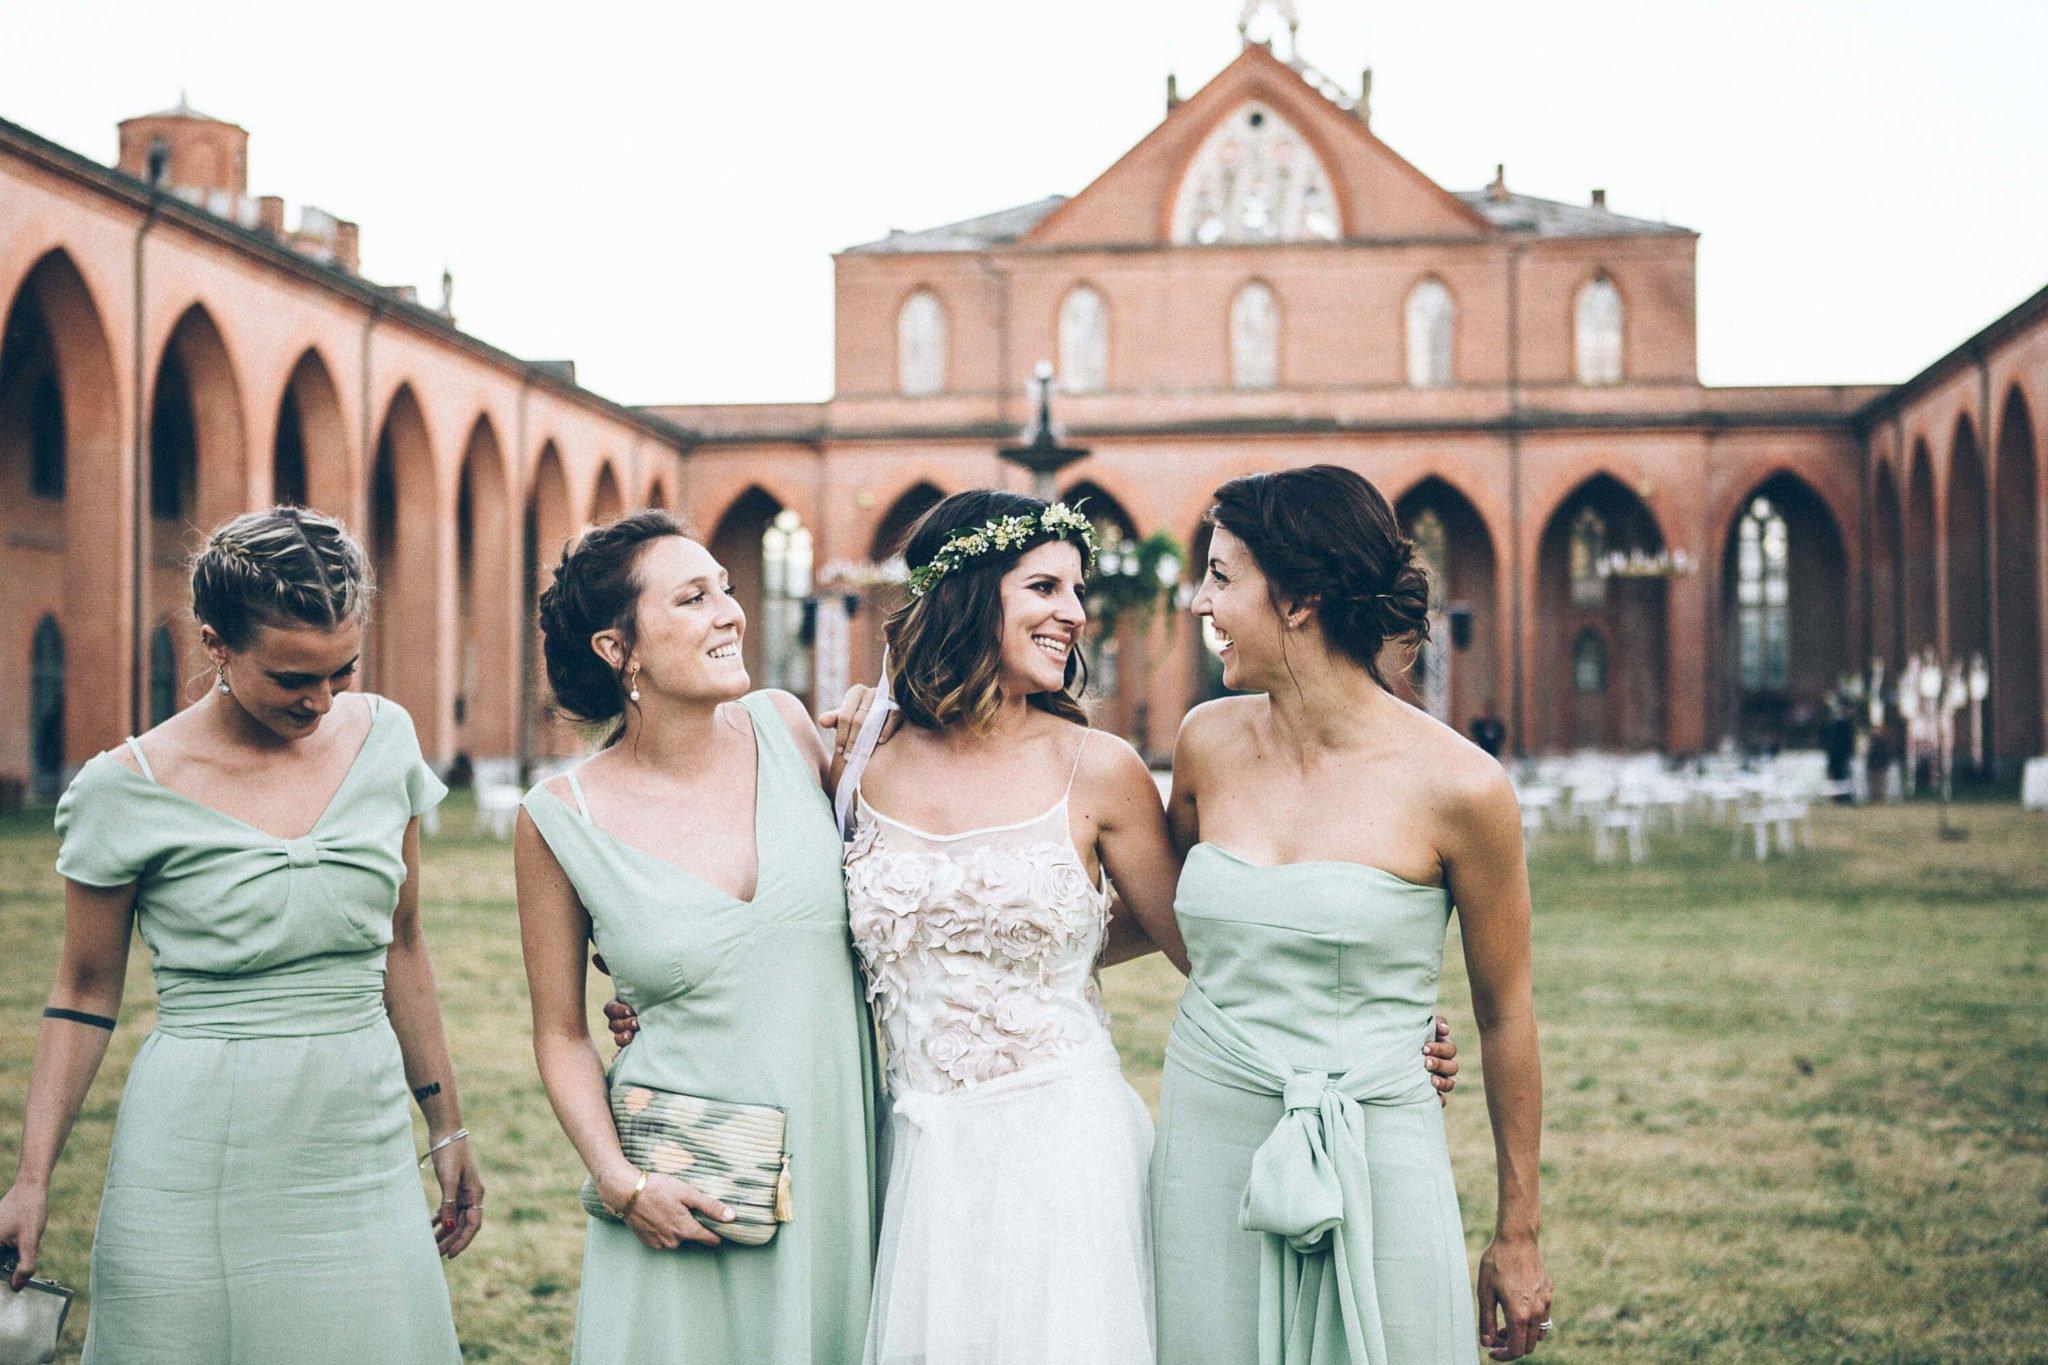 004-wedding-in_serre_di_racconigi_photographer